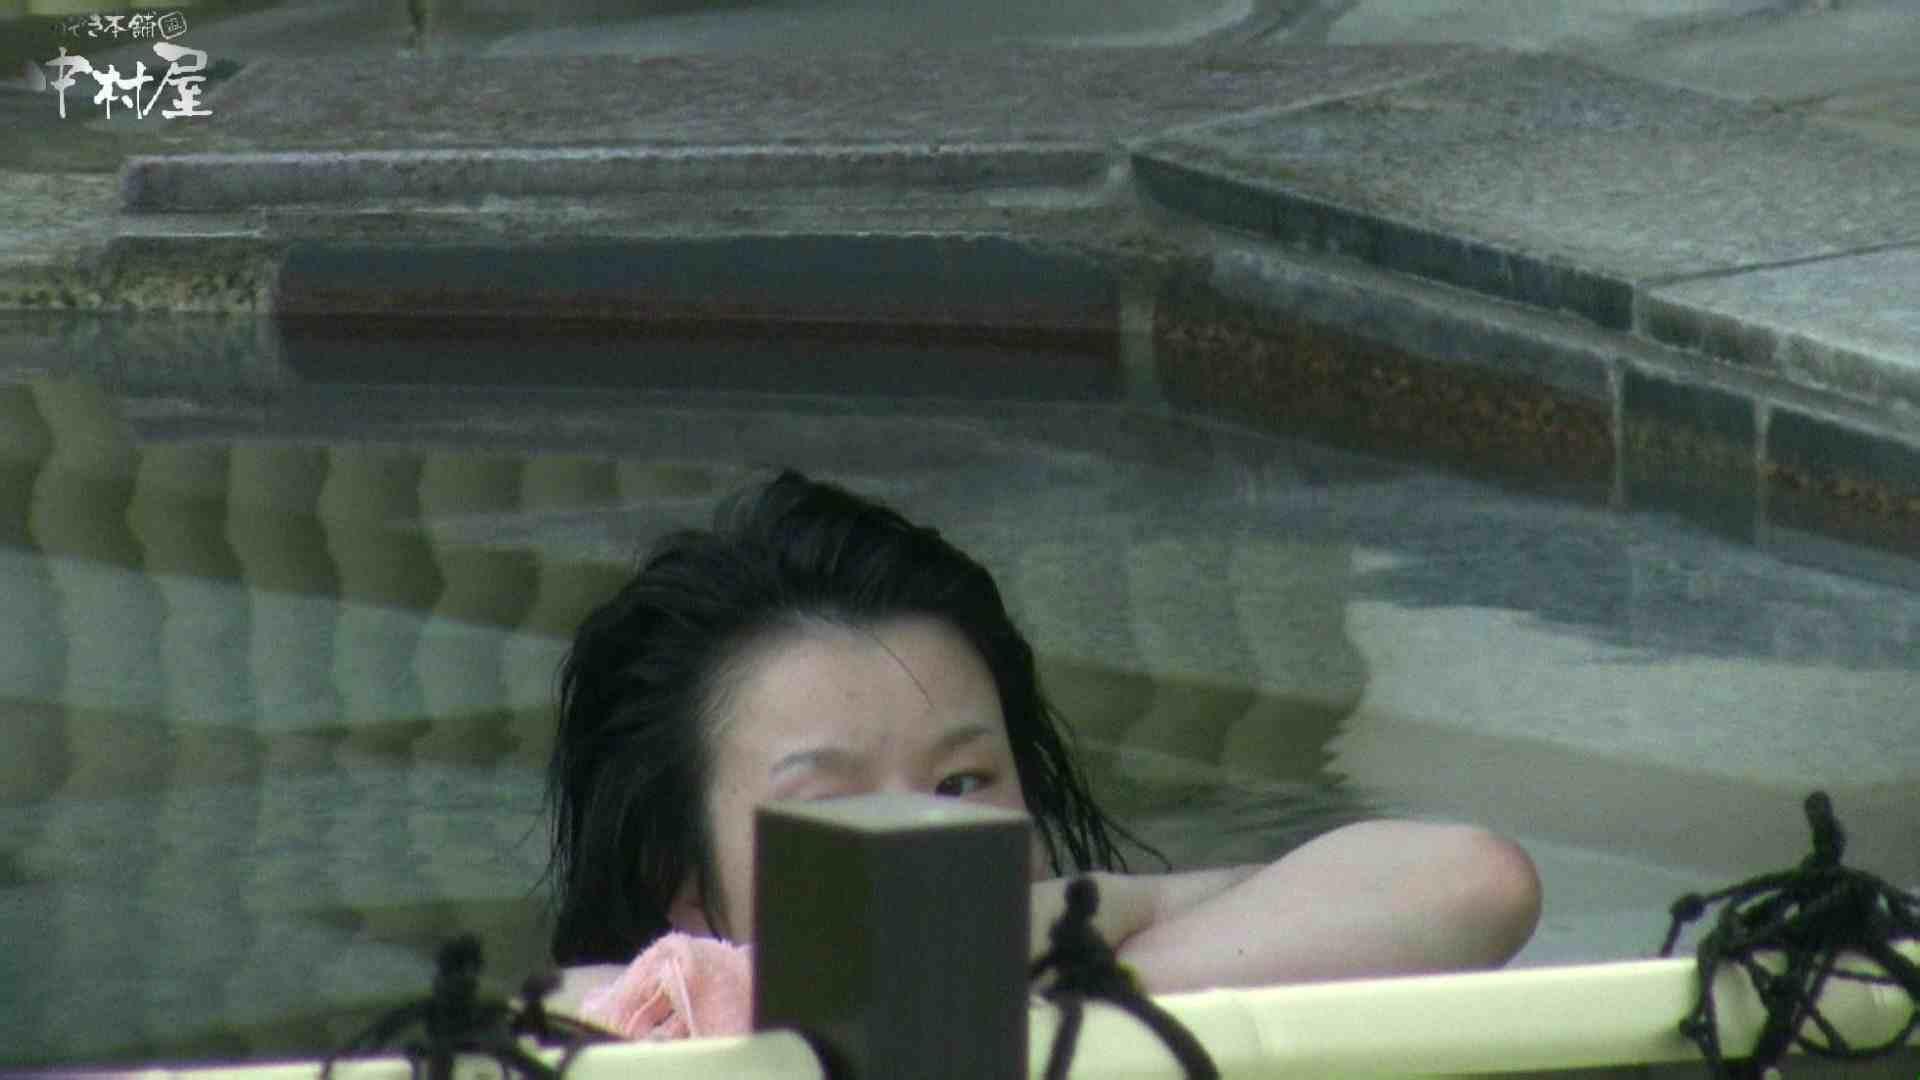 Aquaな露天風呂Vol.982 露天風呂突入 SEX無修正画像 78pic 17